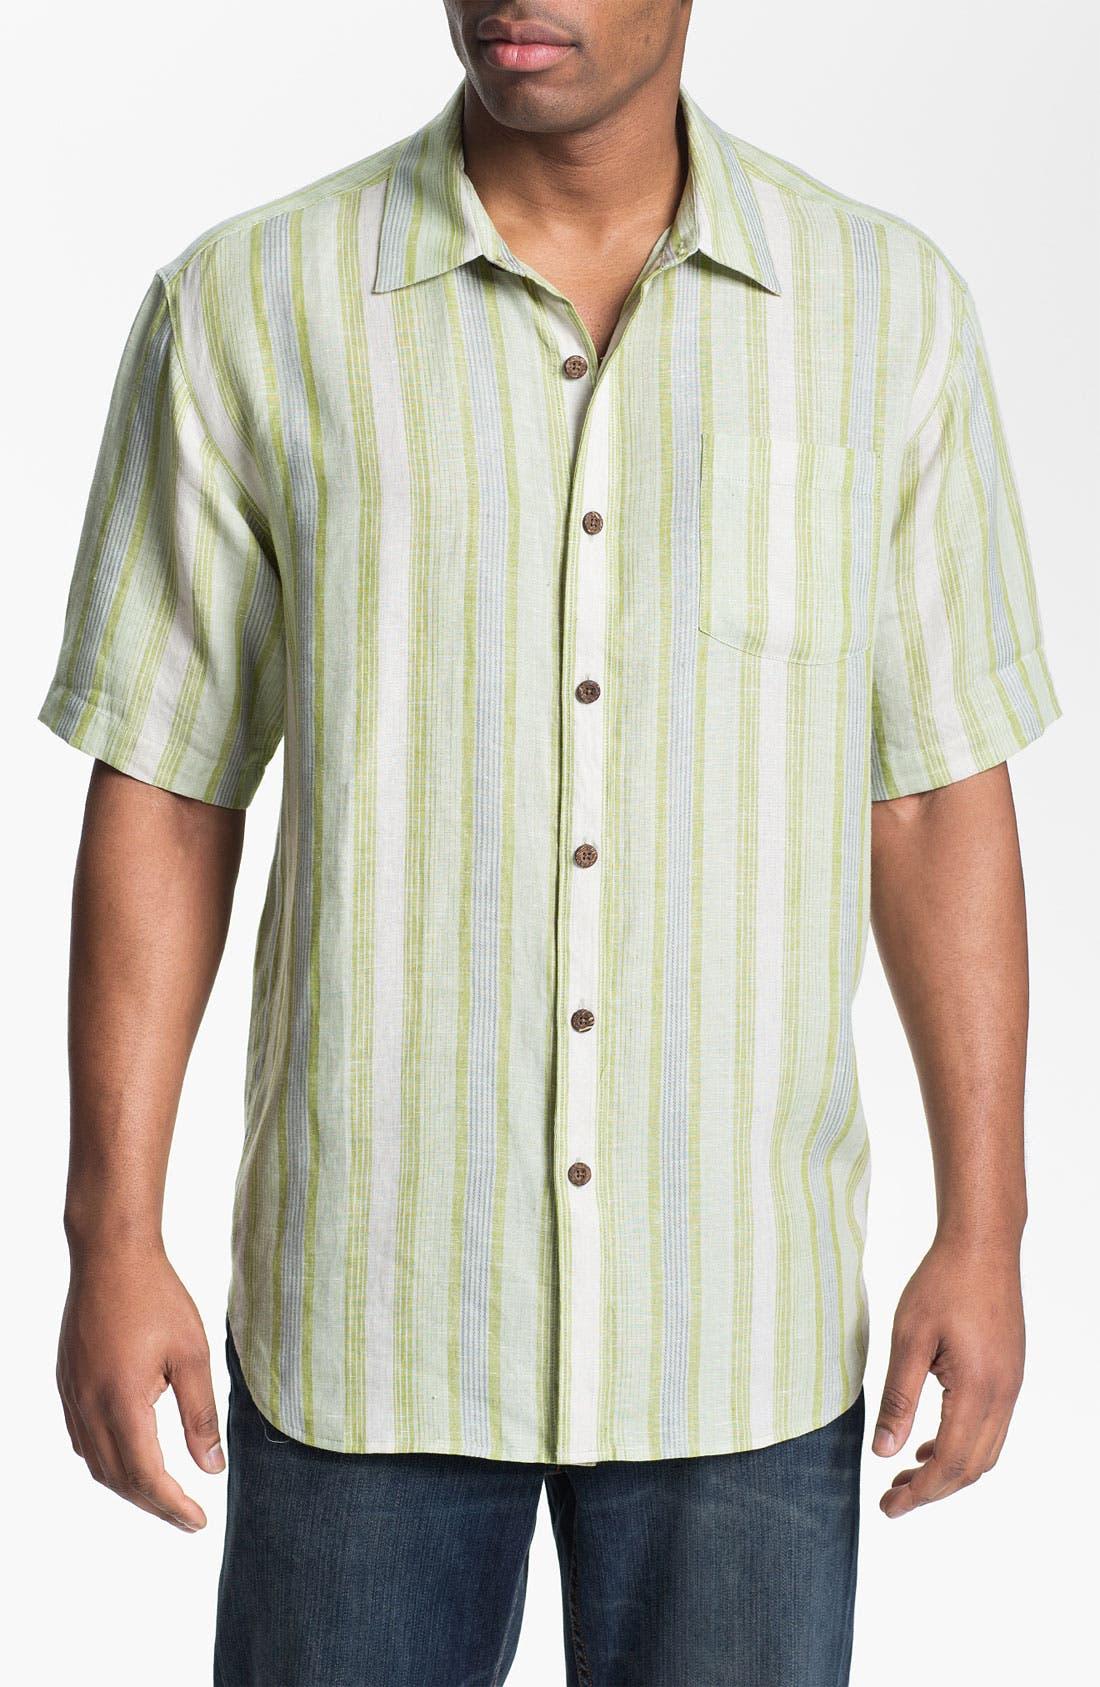 Main Image - Tommy Bahama 'Aquarina' Linen Sport Shirt